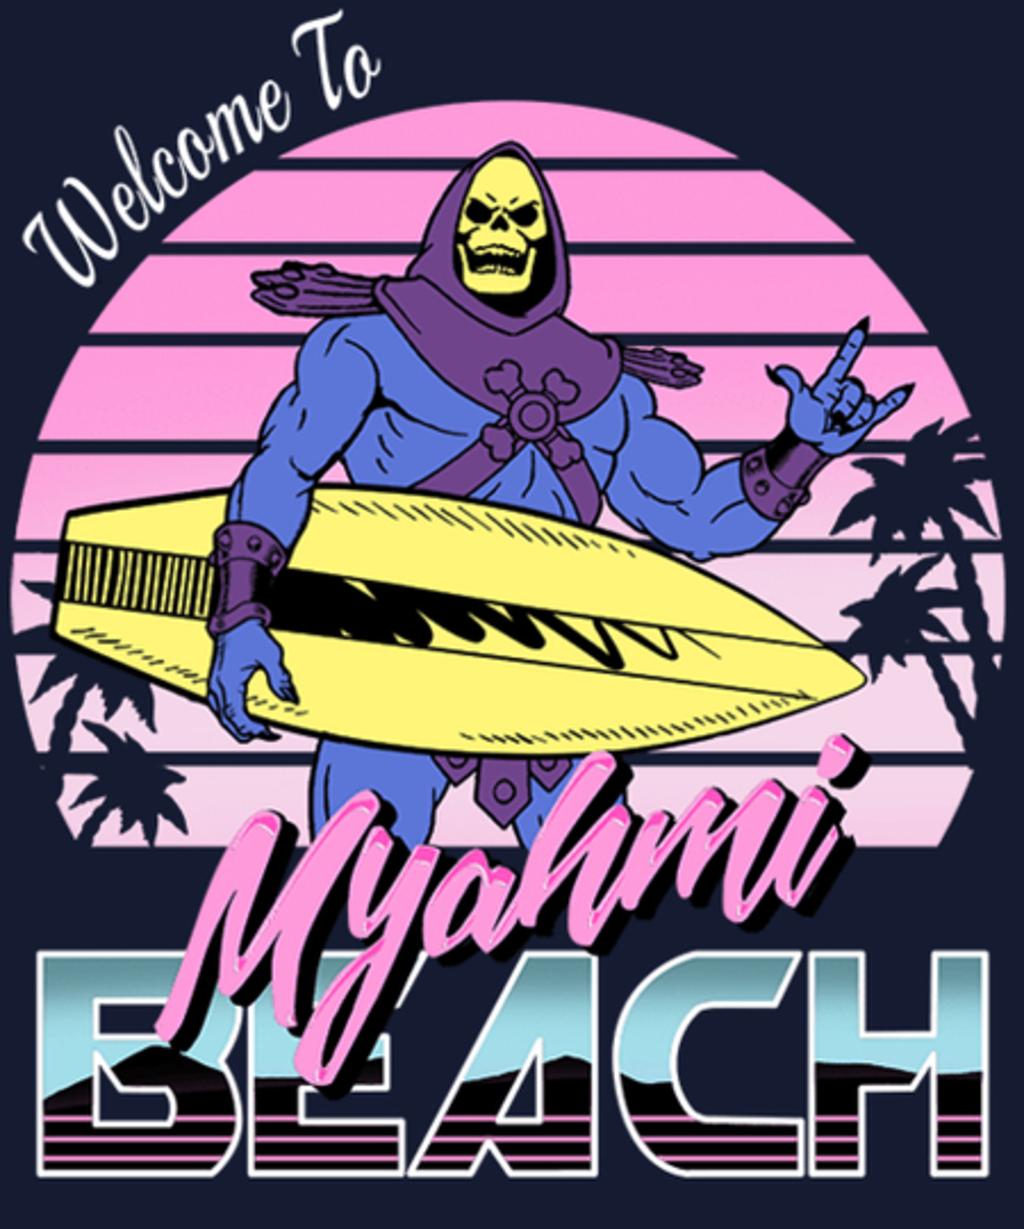 Qwertee: Welcome To Myah'mi Beach